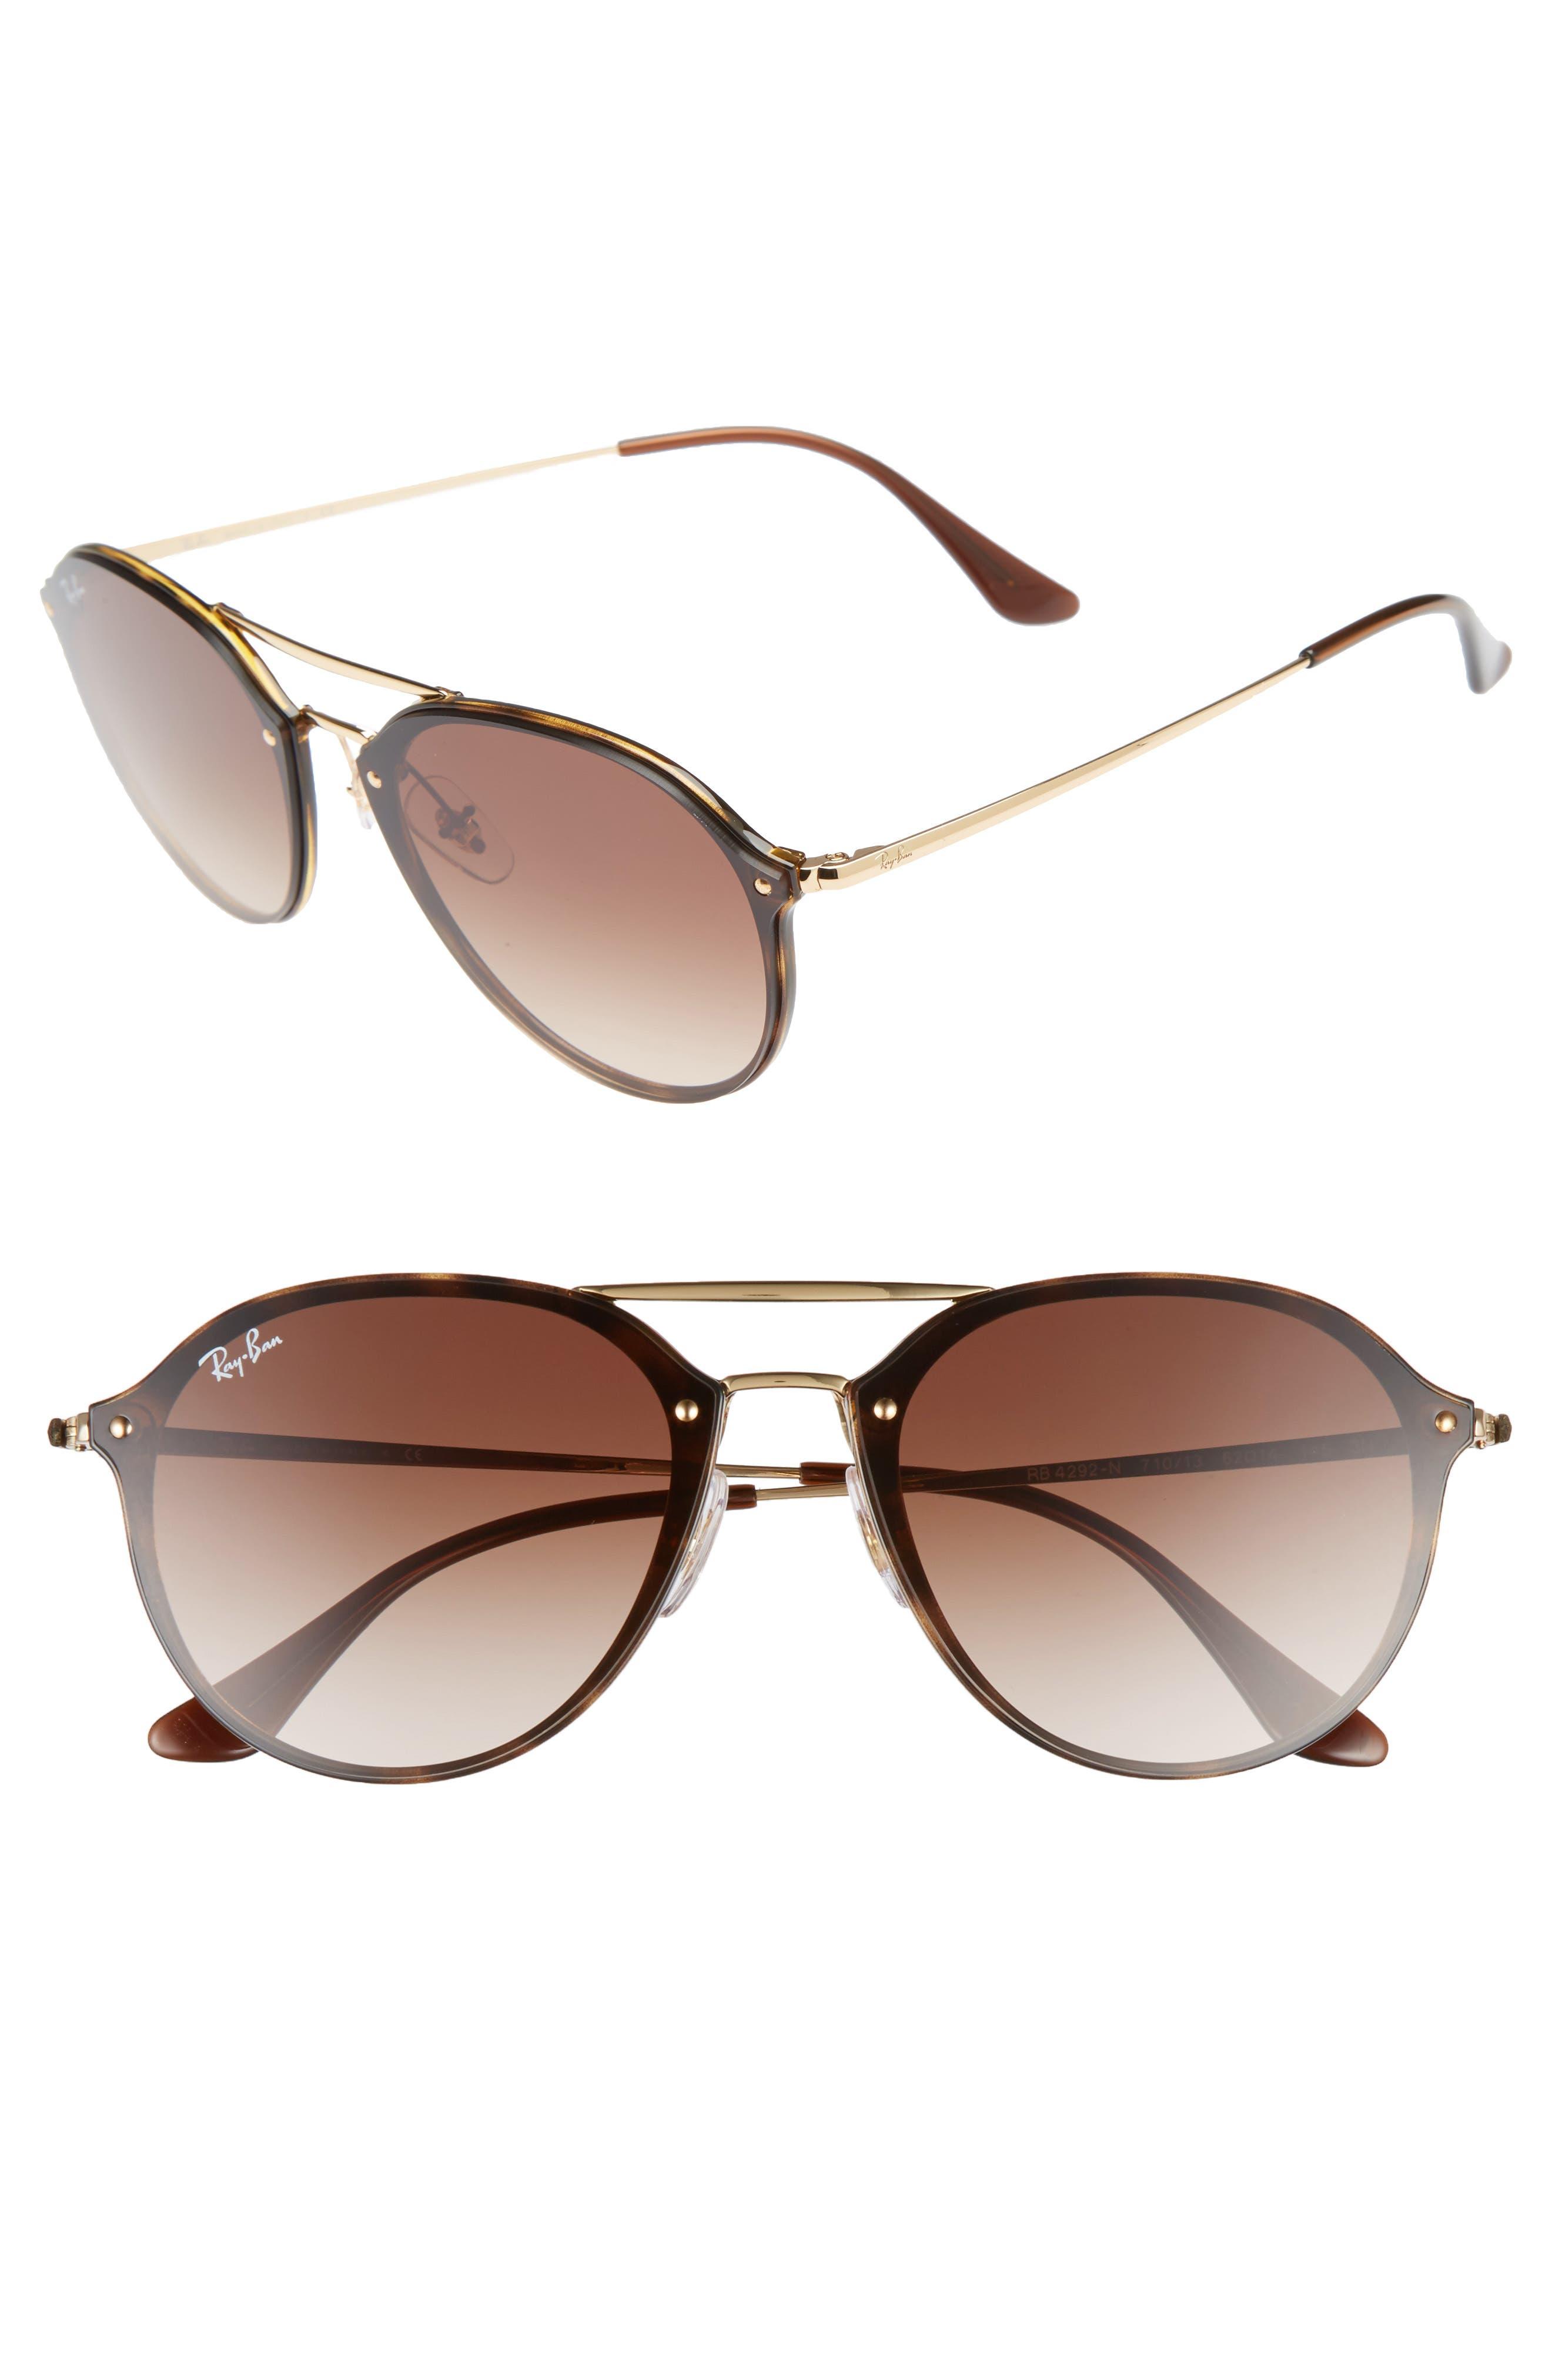 Ray-Ban 62mm Gradient Lens Aviator Sunglasses